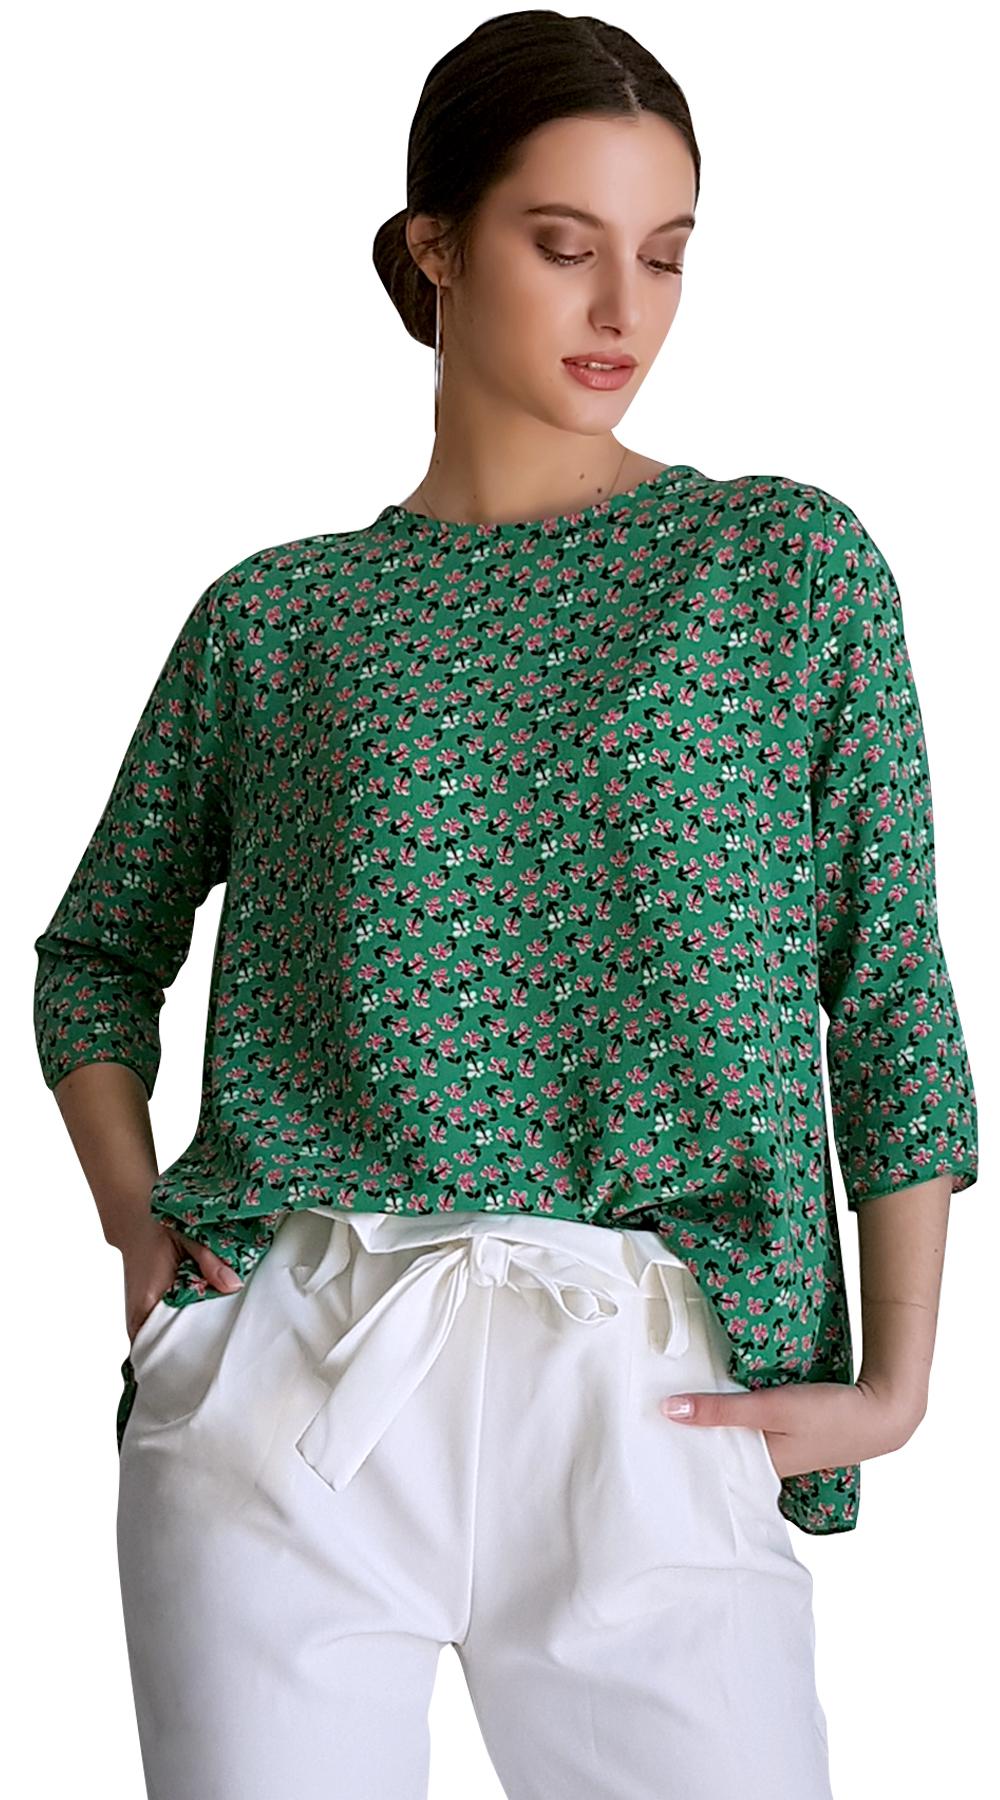 697f92510950 Γυναικεία μπλούζα girly floral με δέσιμο στην πλάτη